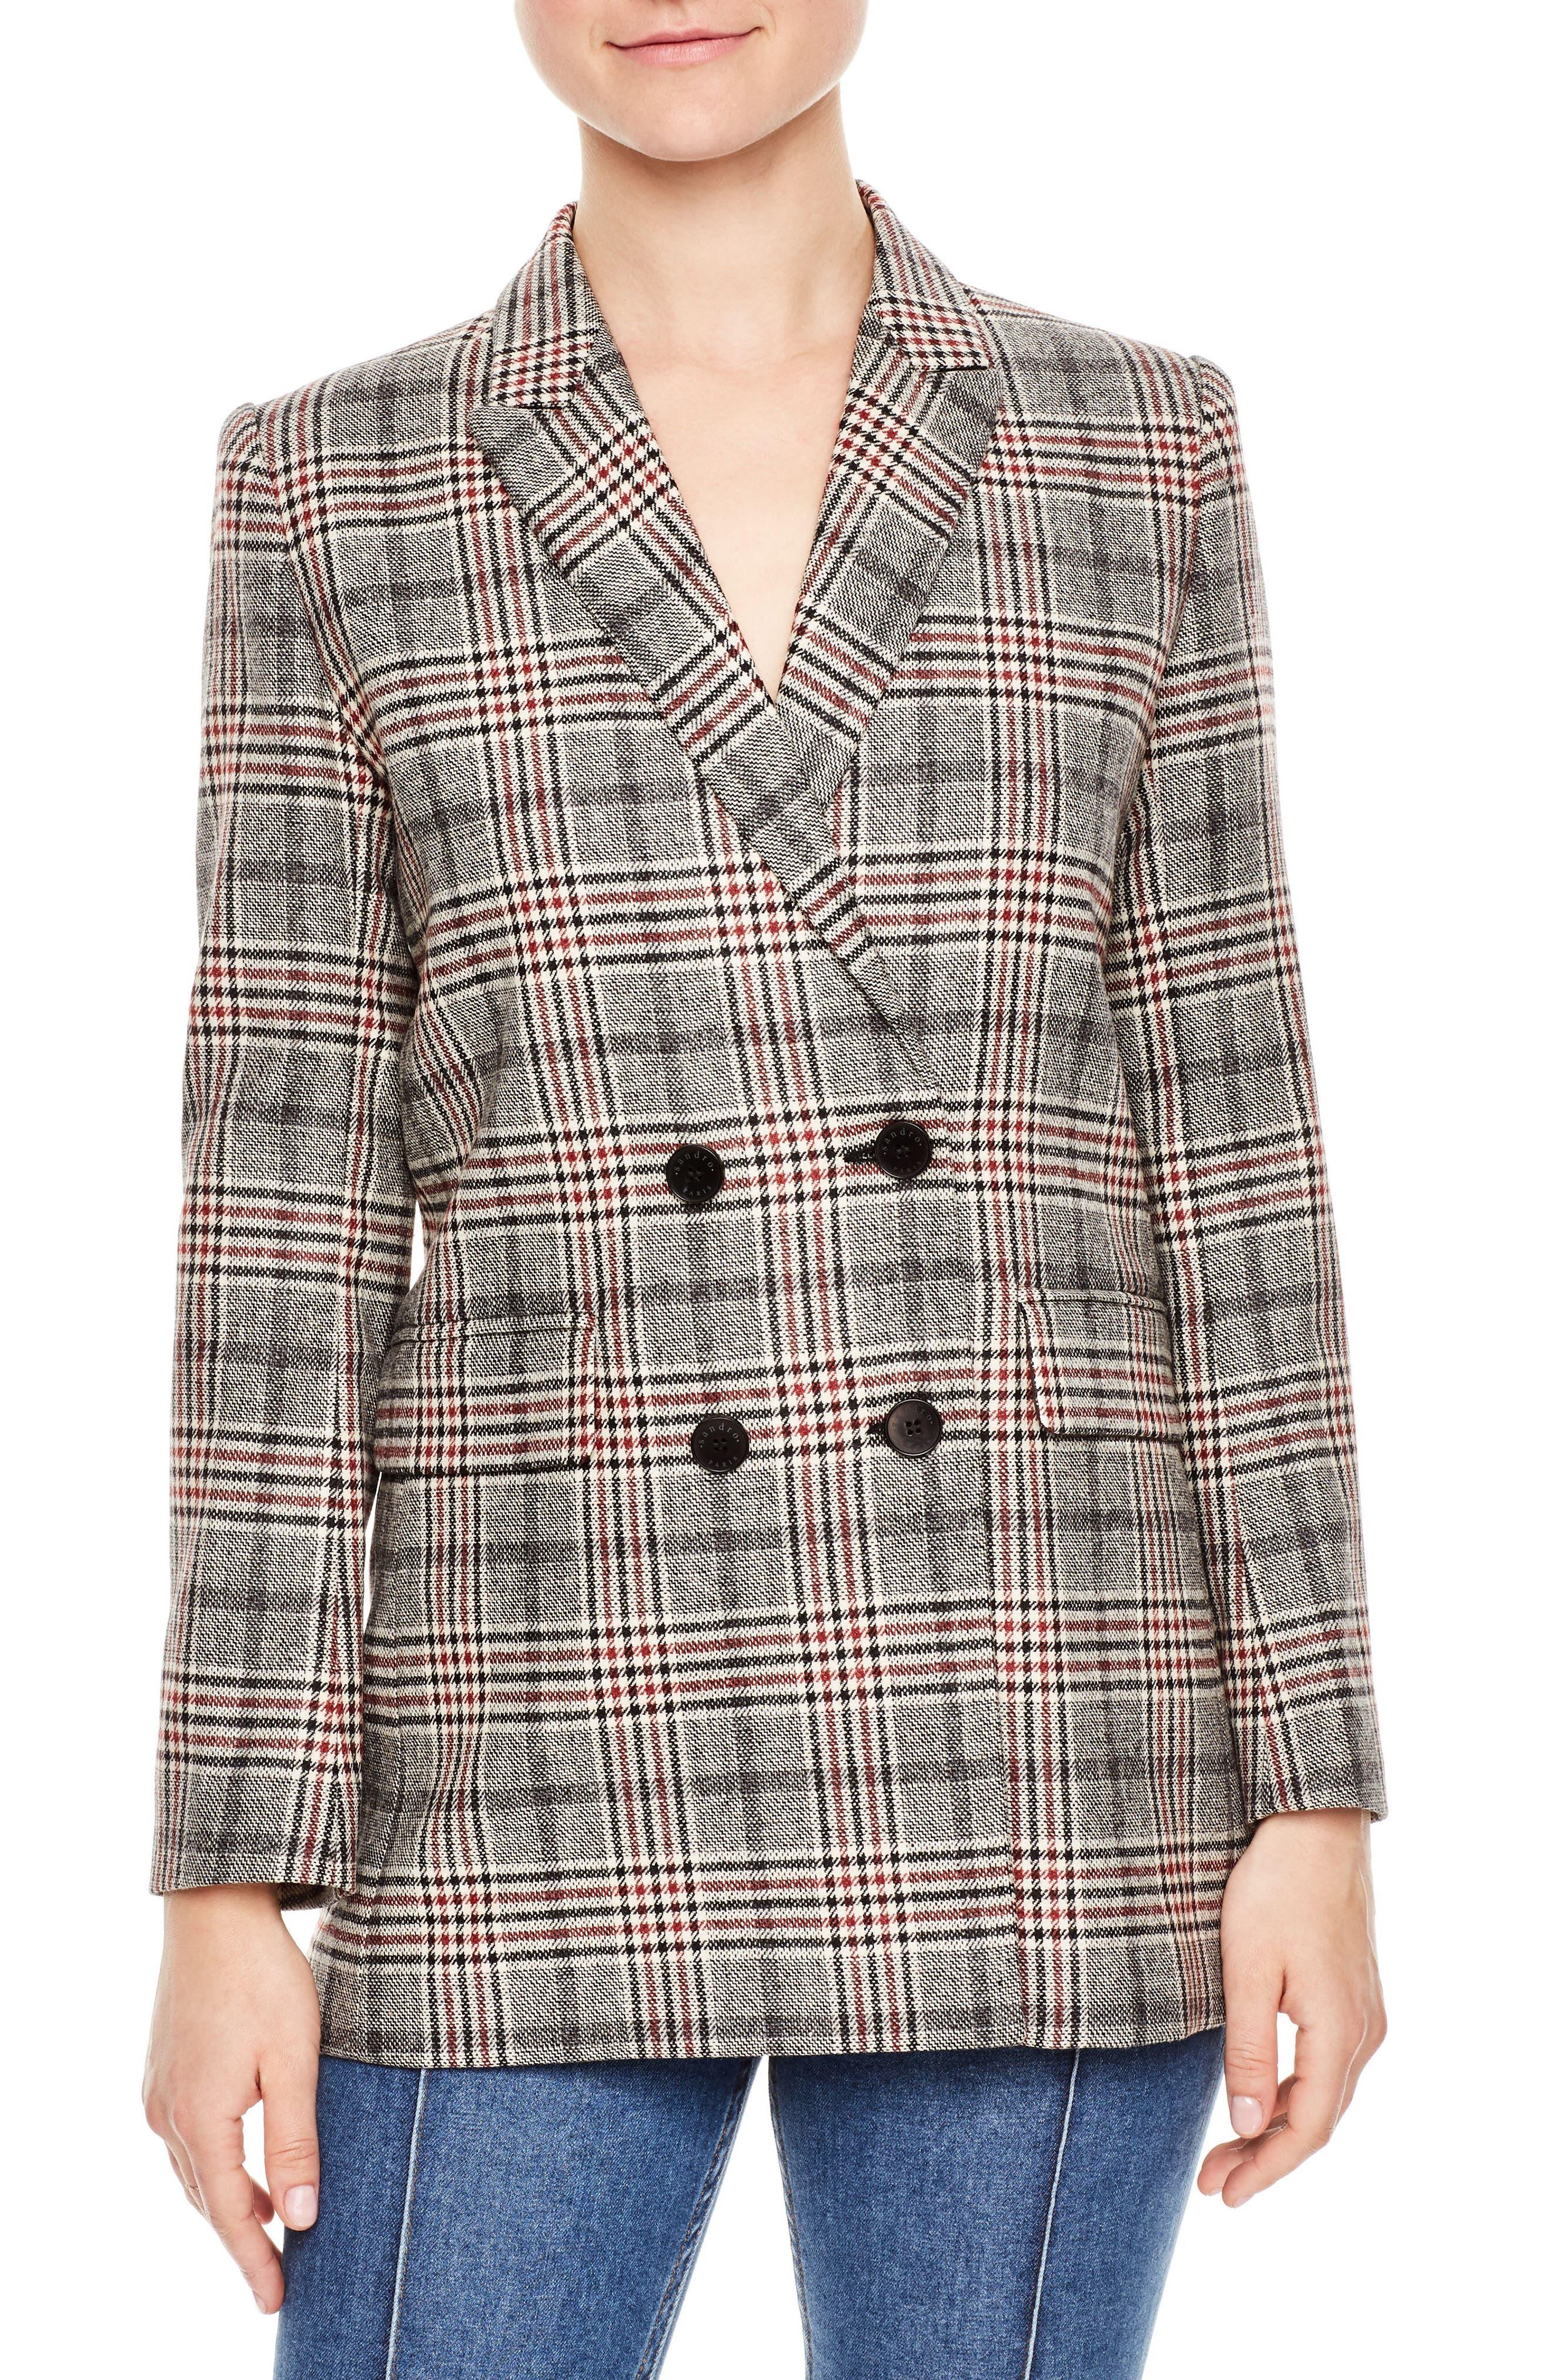 SANDRO, Plaid Wool Blend Jacket, Main thumbnail 1, color, 020